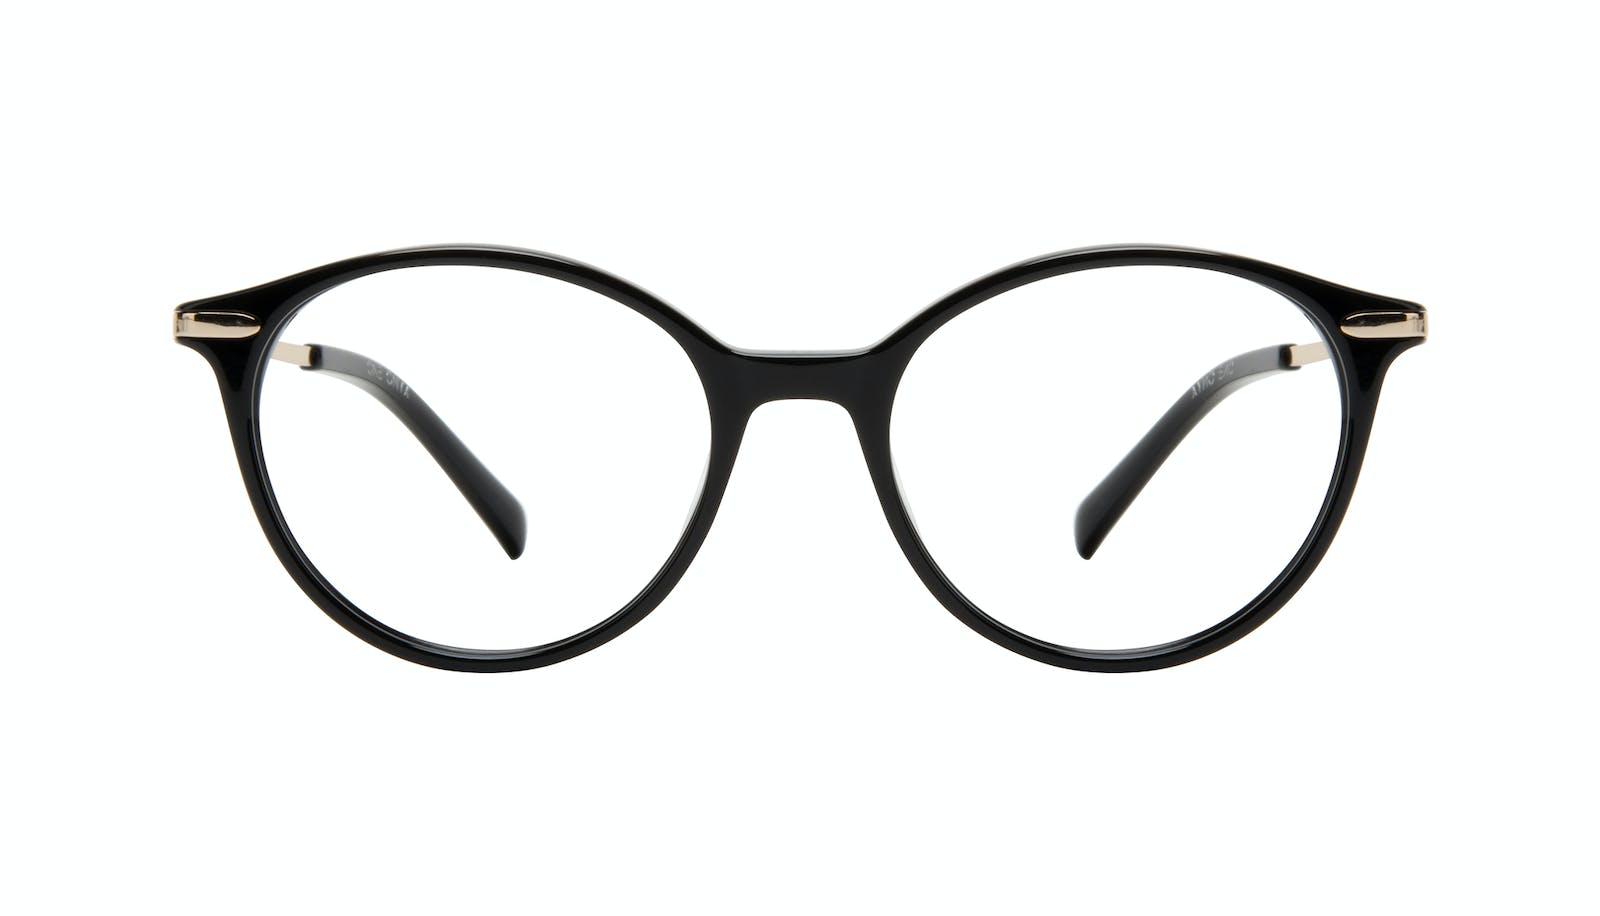 affbff21bc8 Affordable Fashion Glasses Round Eyeglasses Women One Onyx